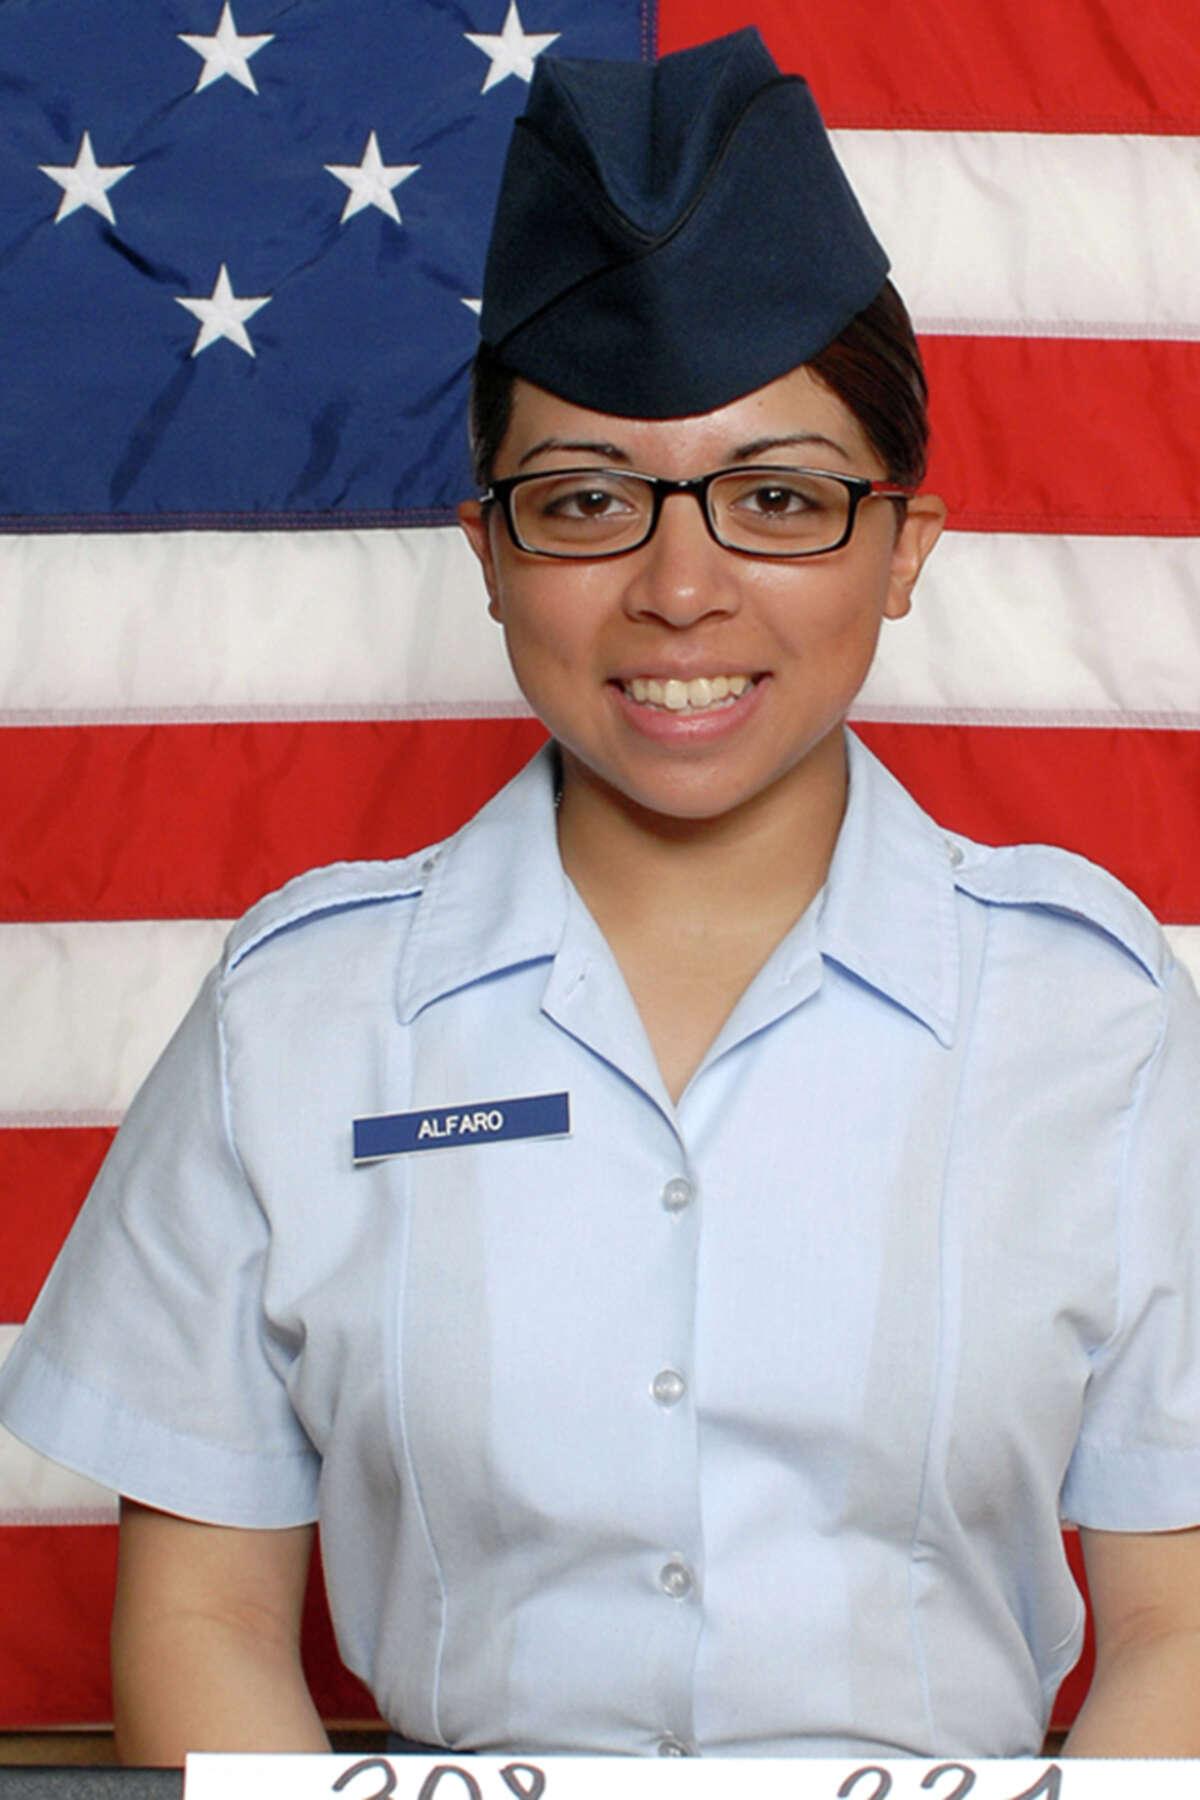 Martha C. Alfaro recently completed basic military training.